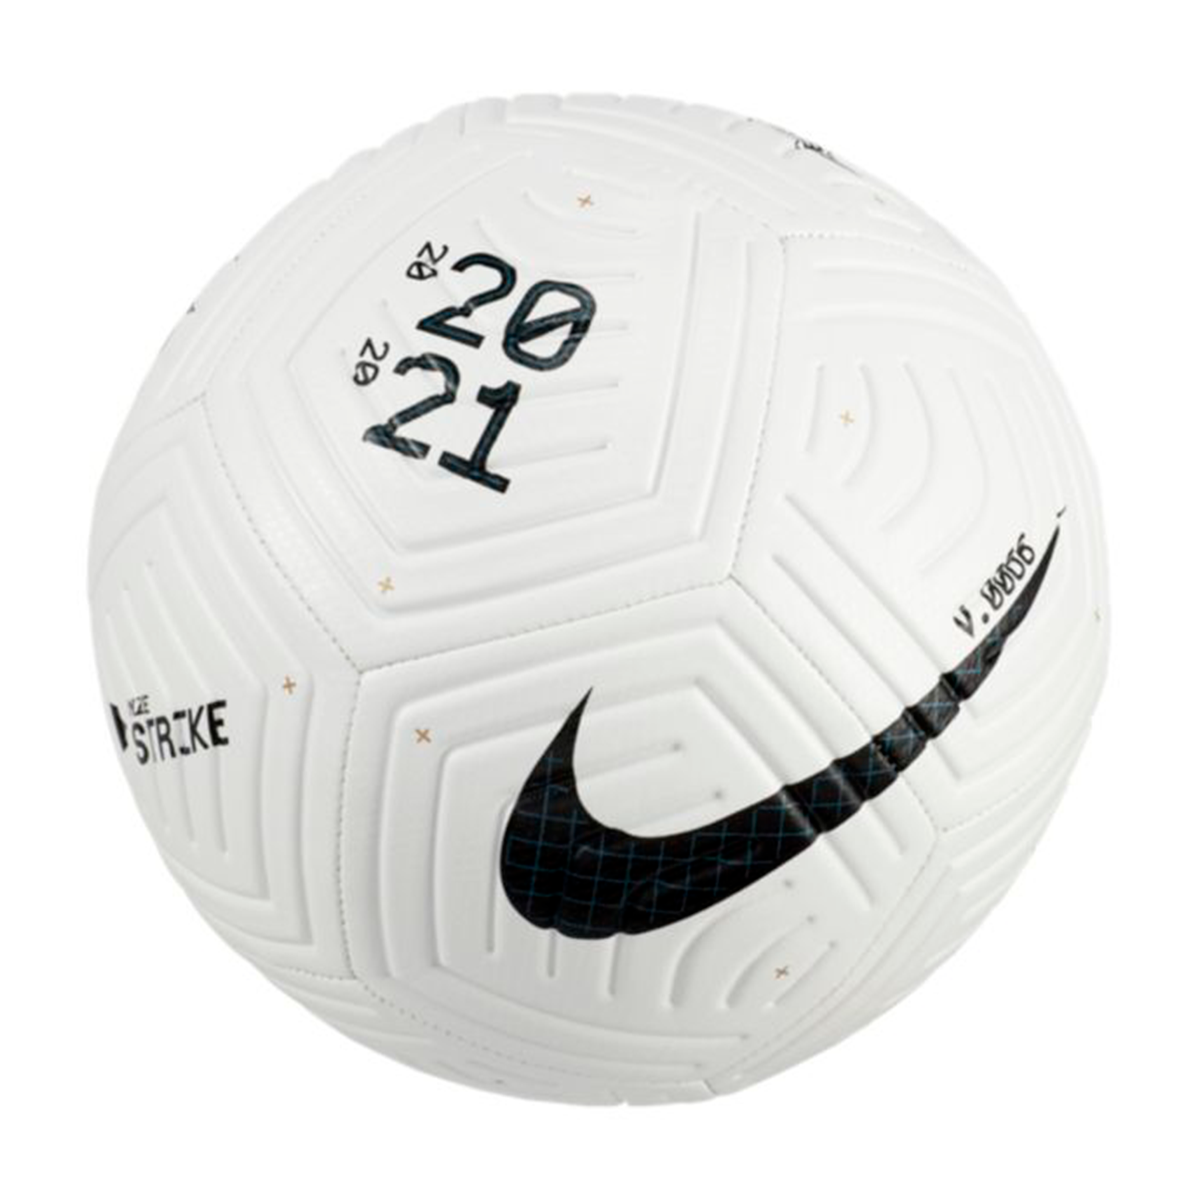 Litoral Desgracia datos  Ball Nike Strike 2020-2021 White-Black - Football store Fútbol Emotion